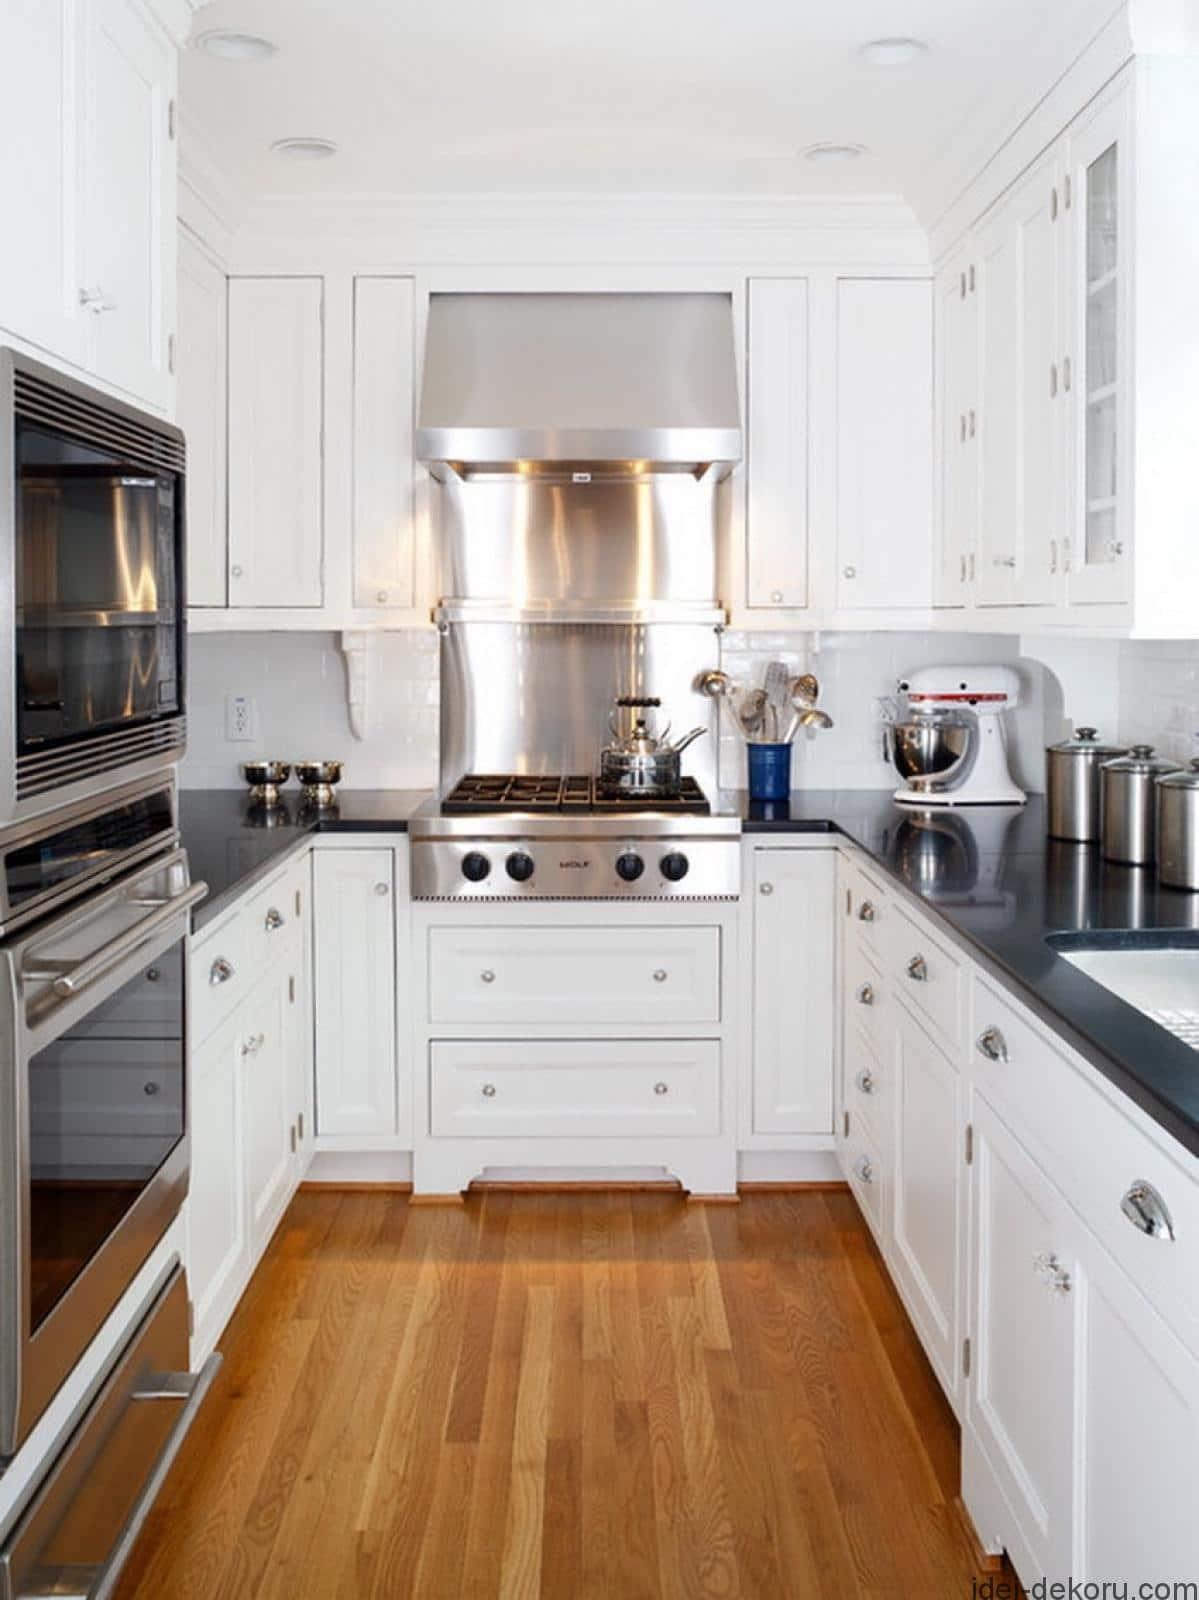 Best Small White Kitchen Design Ideas for 20   Best Online Cabinets